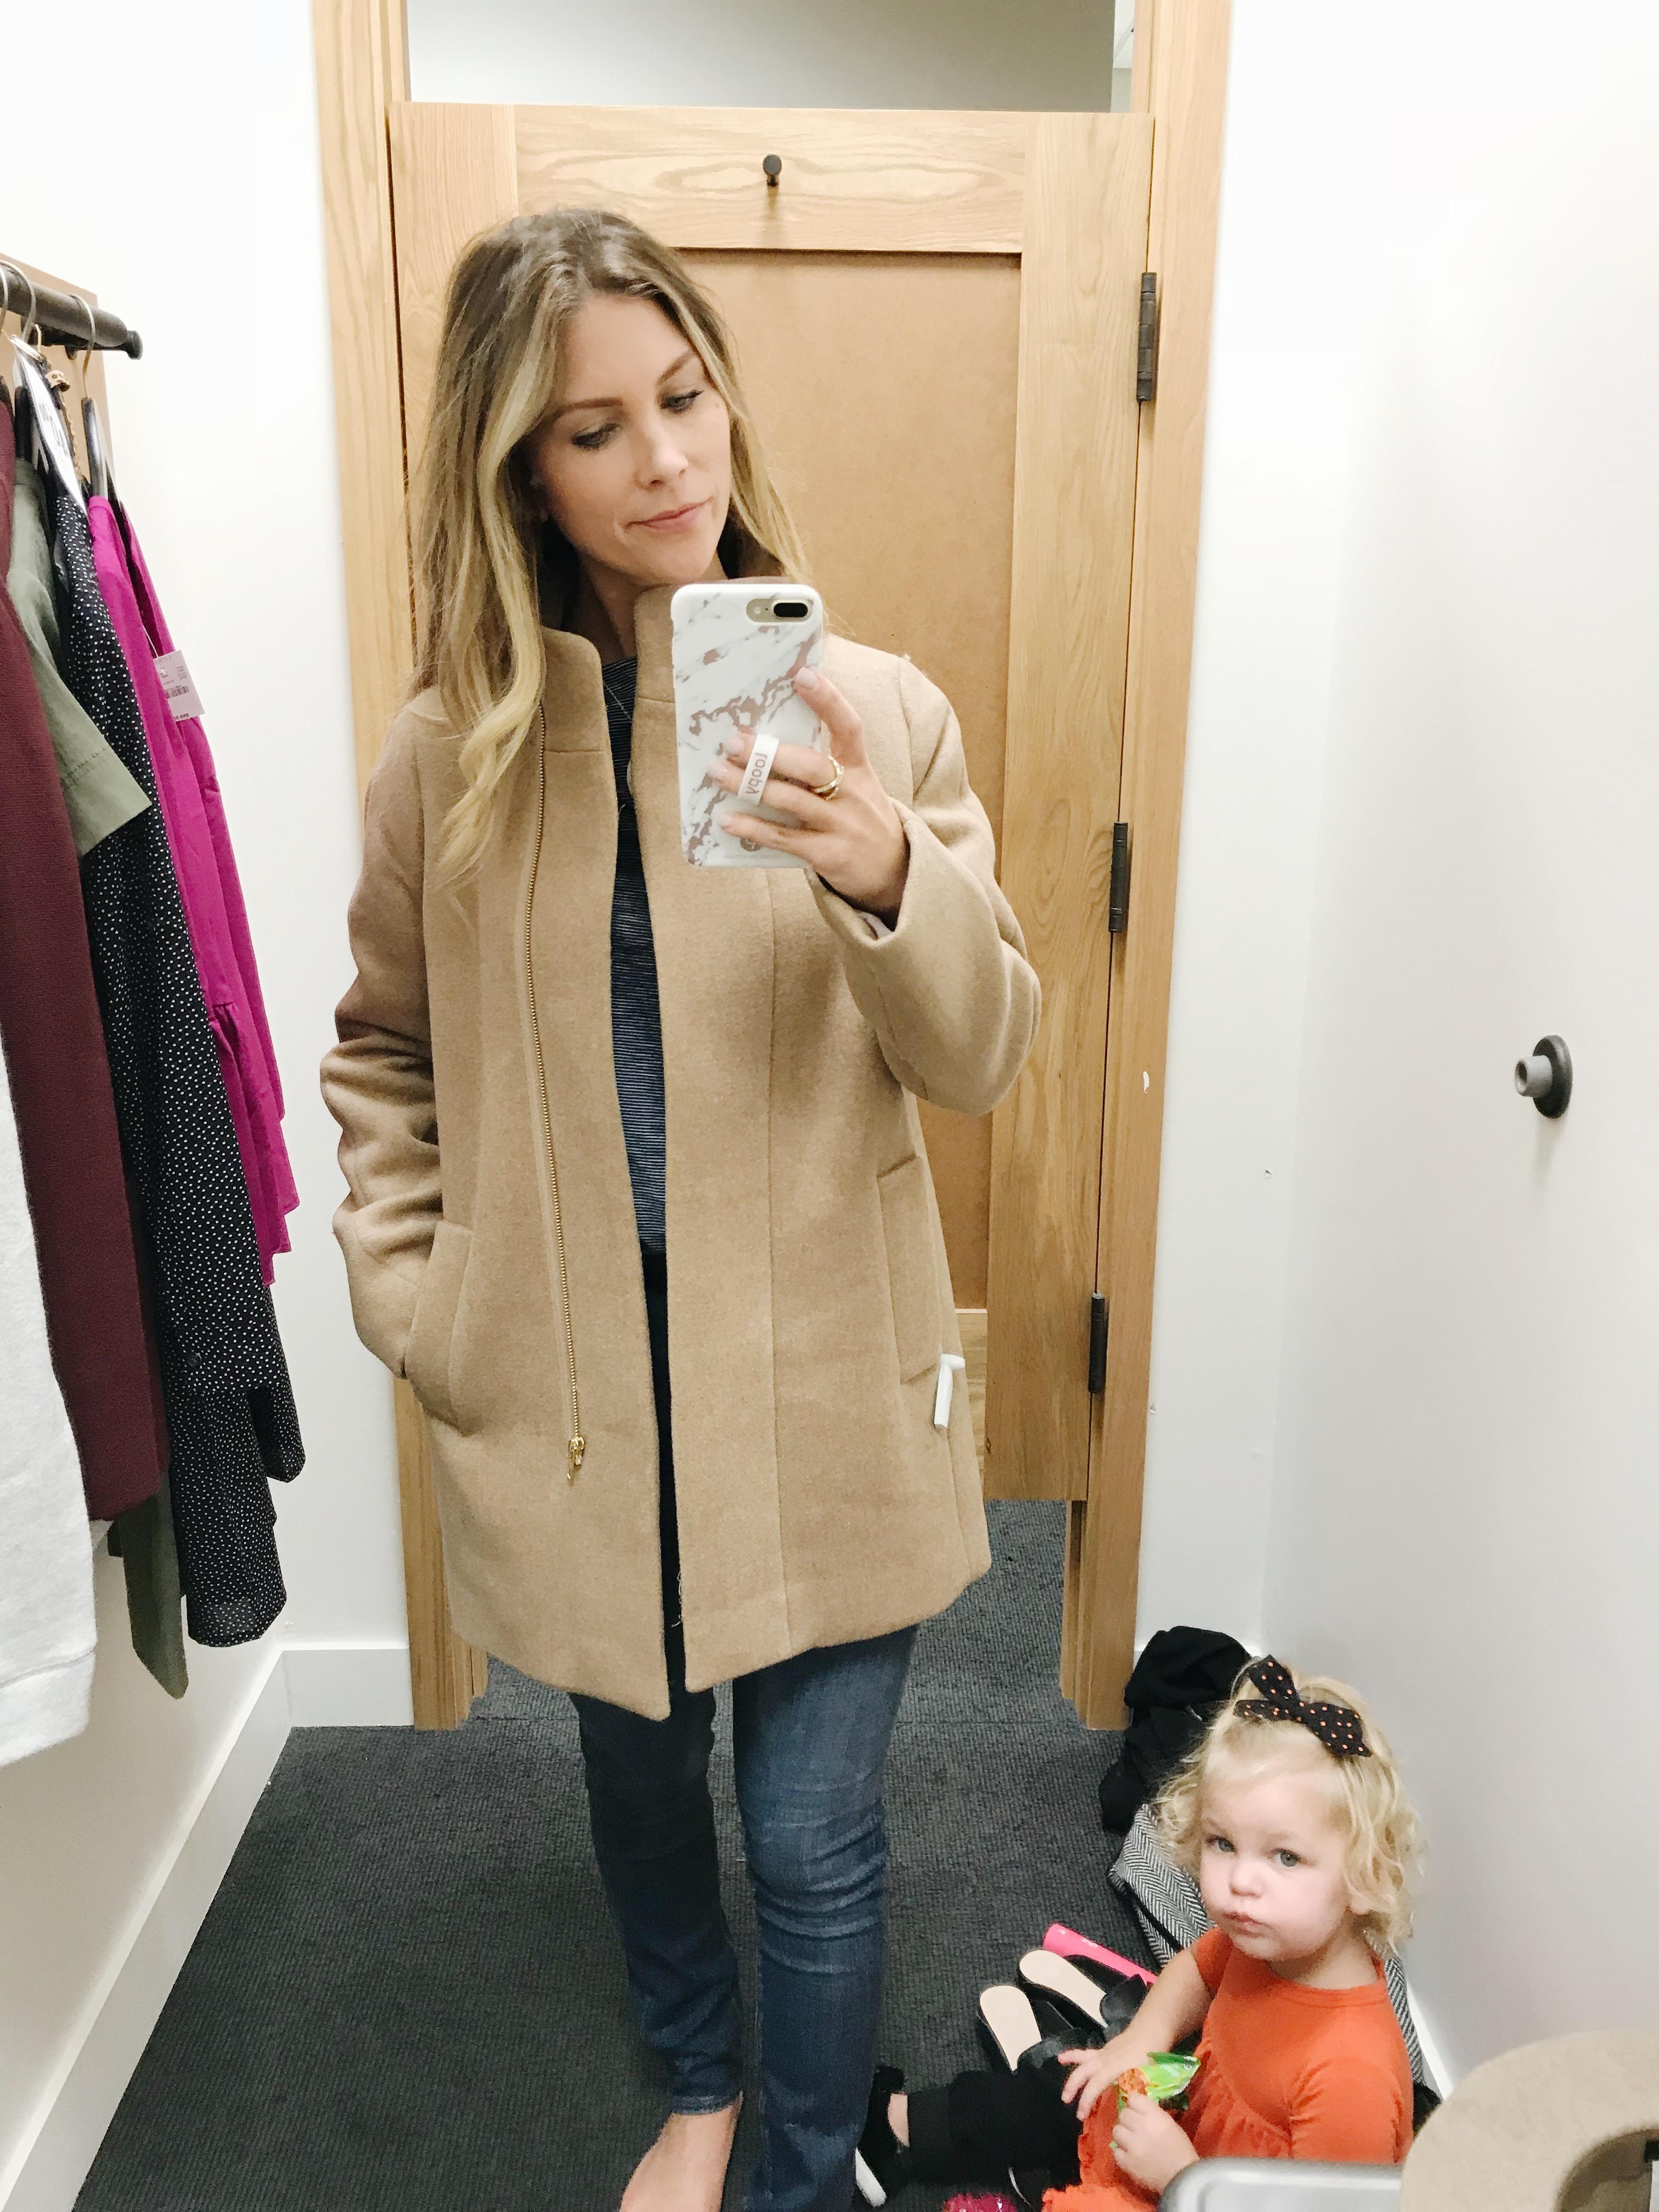 To acquire Fashion Winter haul: hm and j. Crew picture trends